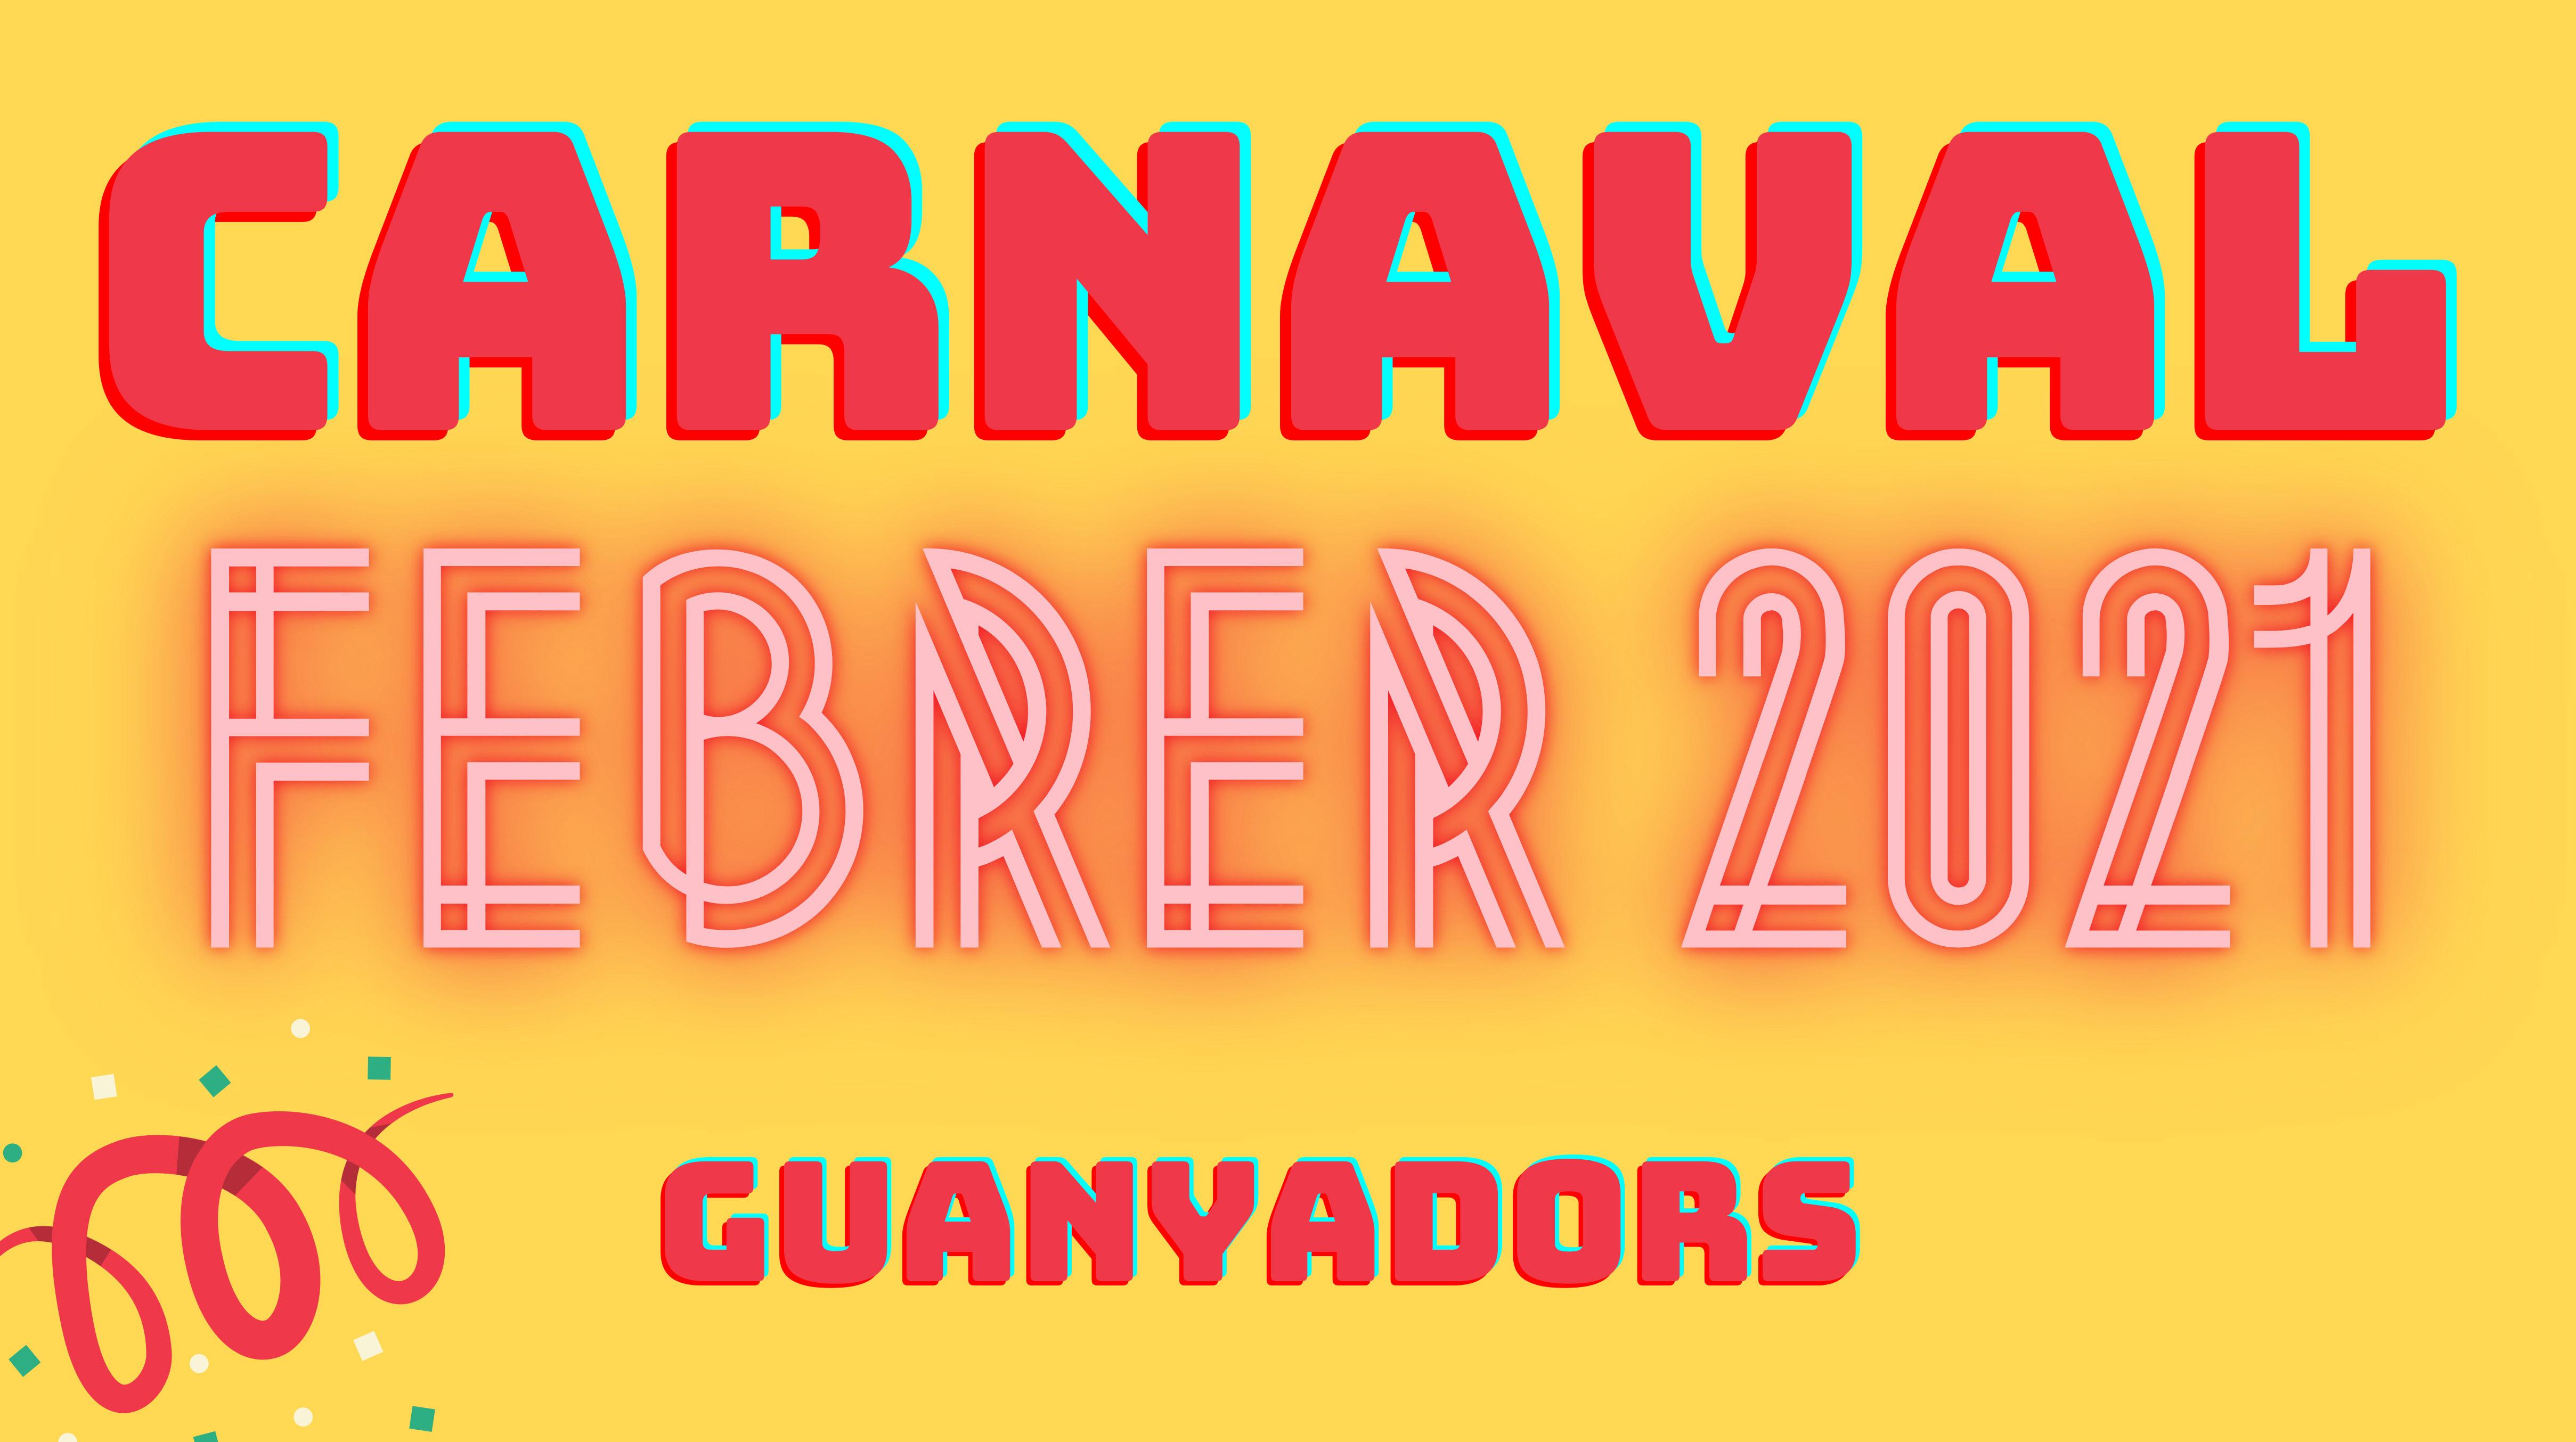 Guanyadors Carnaval 2021